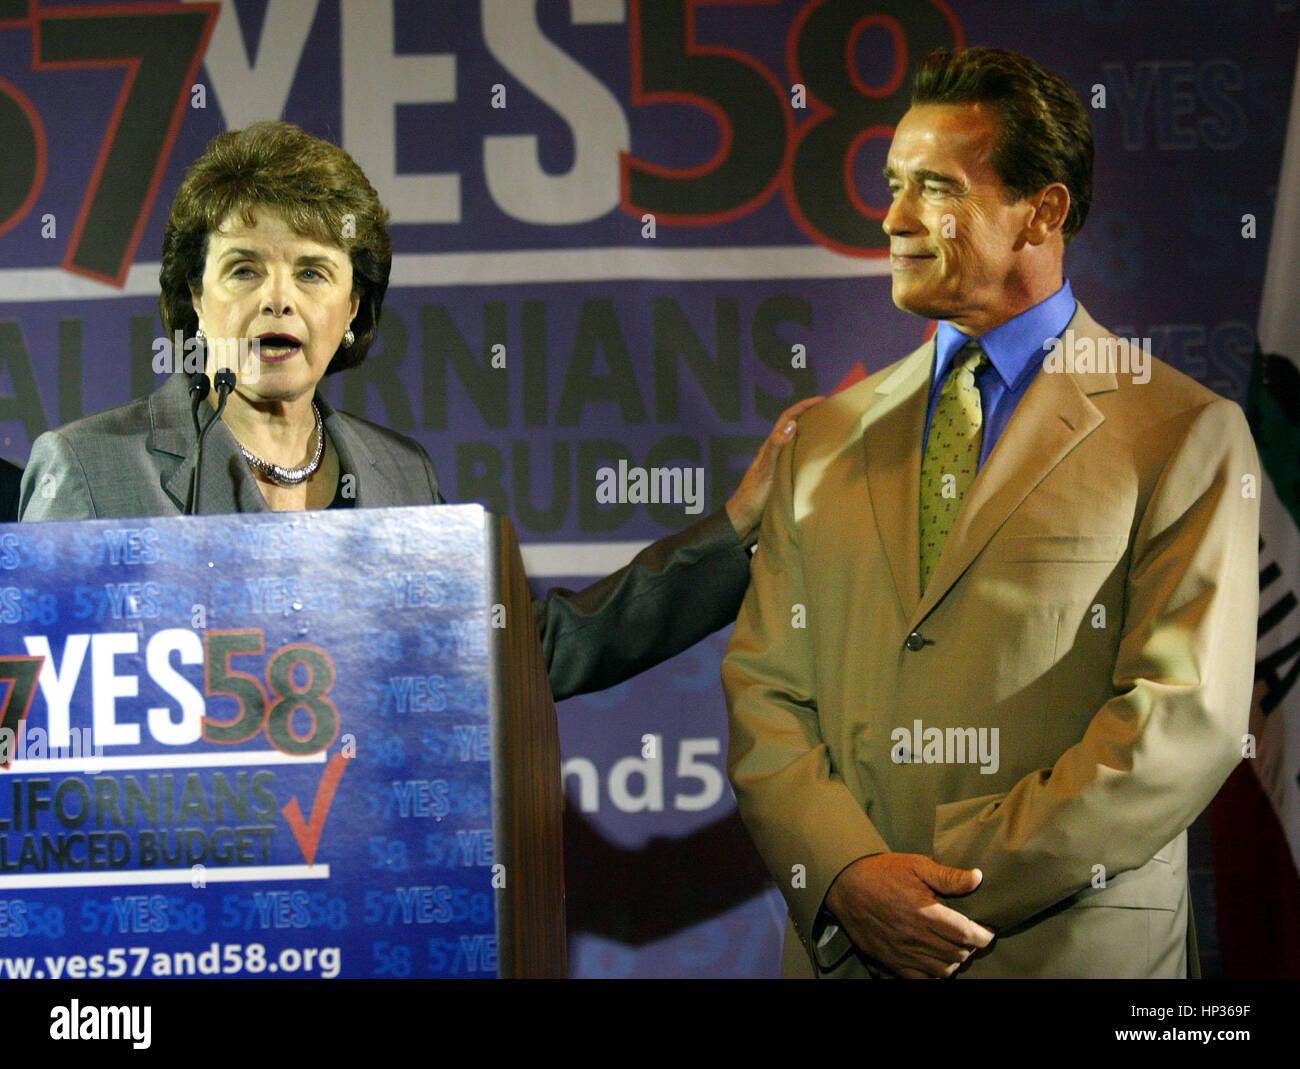 California Gov. Arnold Schwarzenegger, (R), and US Sen. Dianne Feinstein meet at a press conference to endorse California - Stock Image